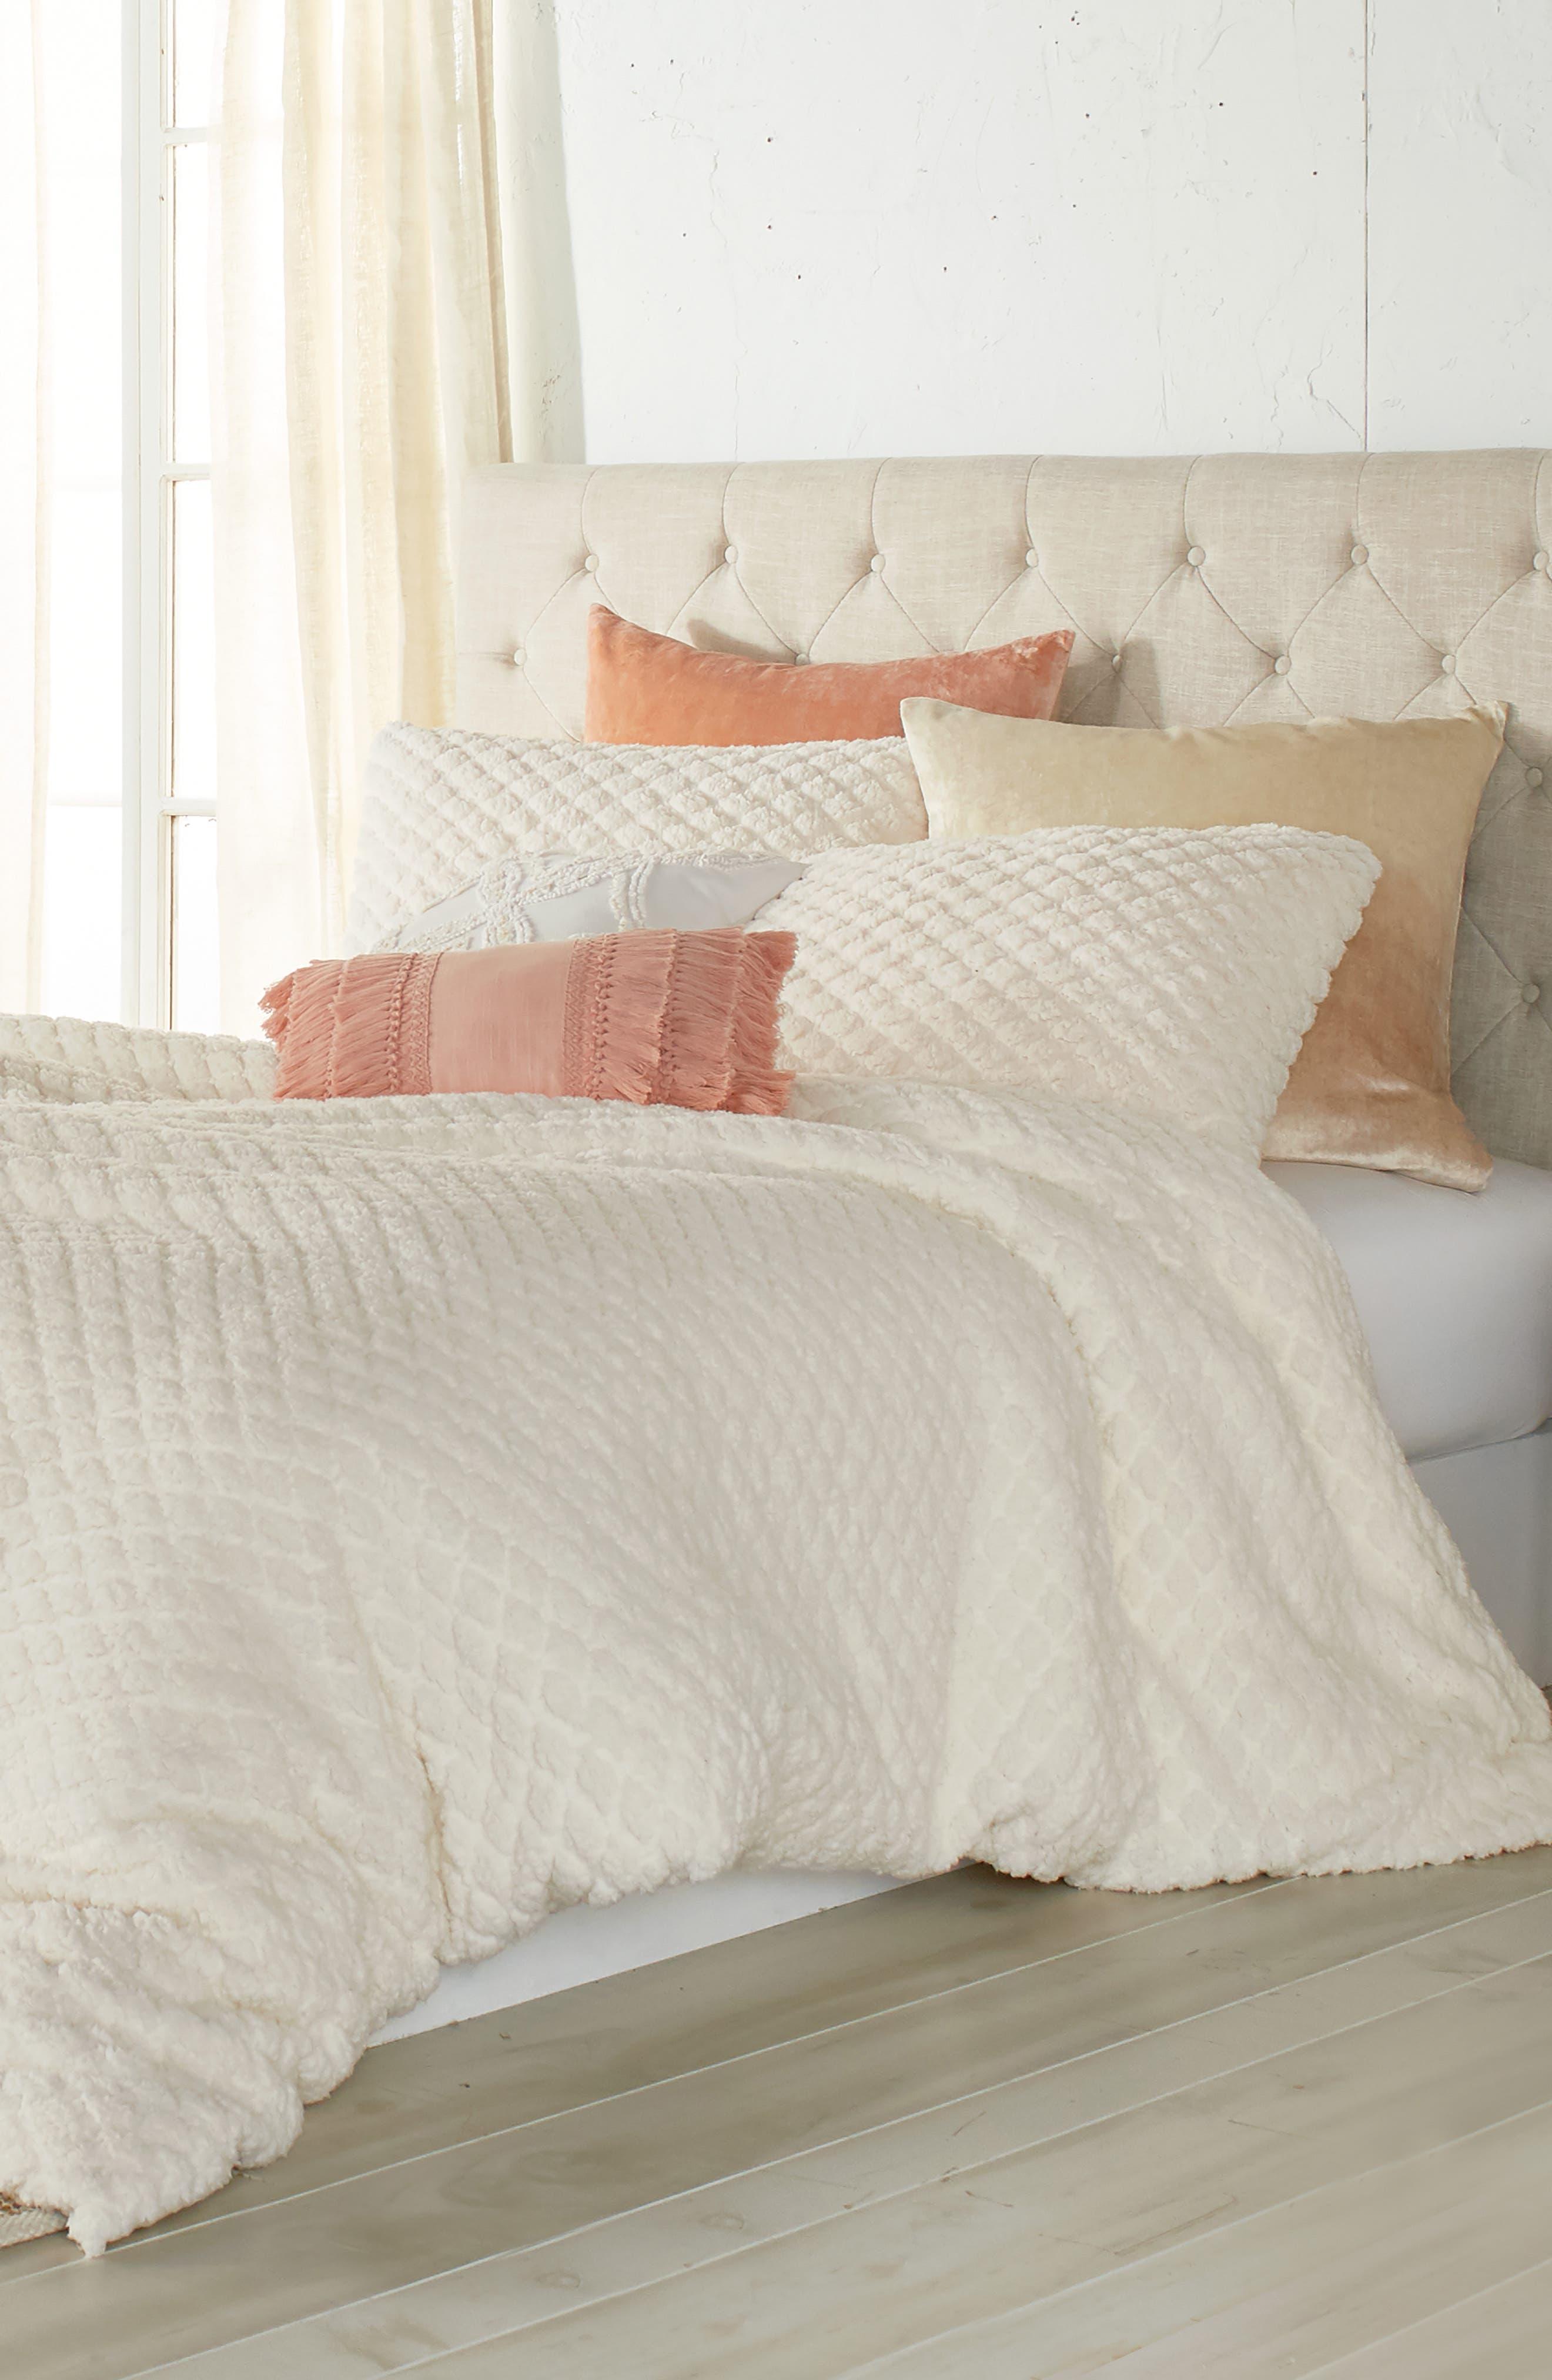 Diamond High Pile Fleece Comforter & Sham Set, Main, color, 902